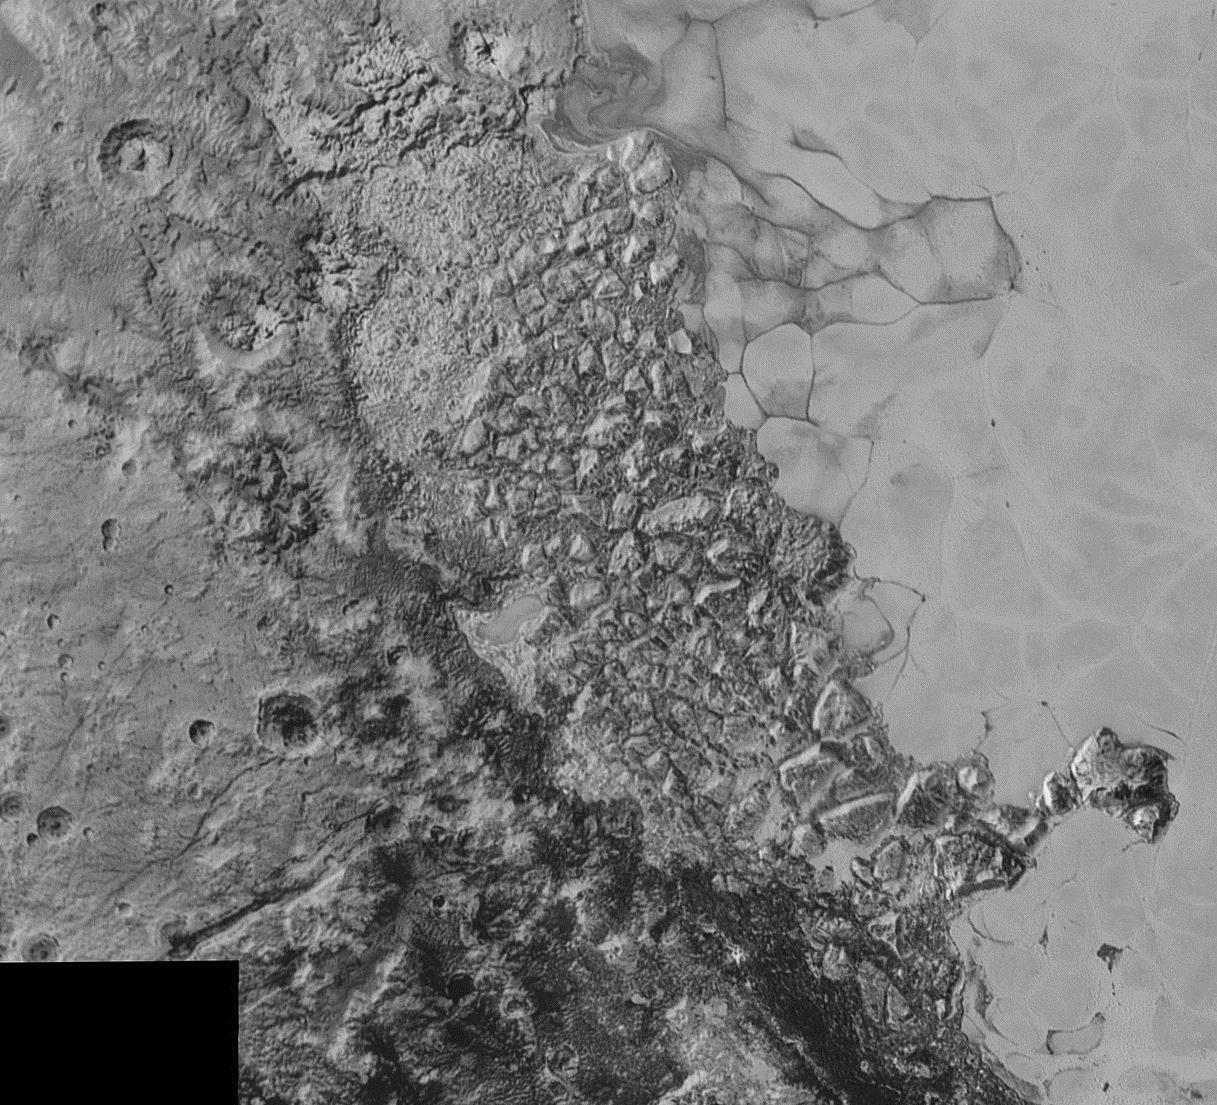 Chaos terrain on Pluto! Image credit: NASA/SWRI.